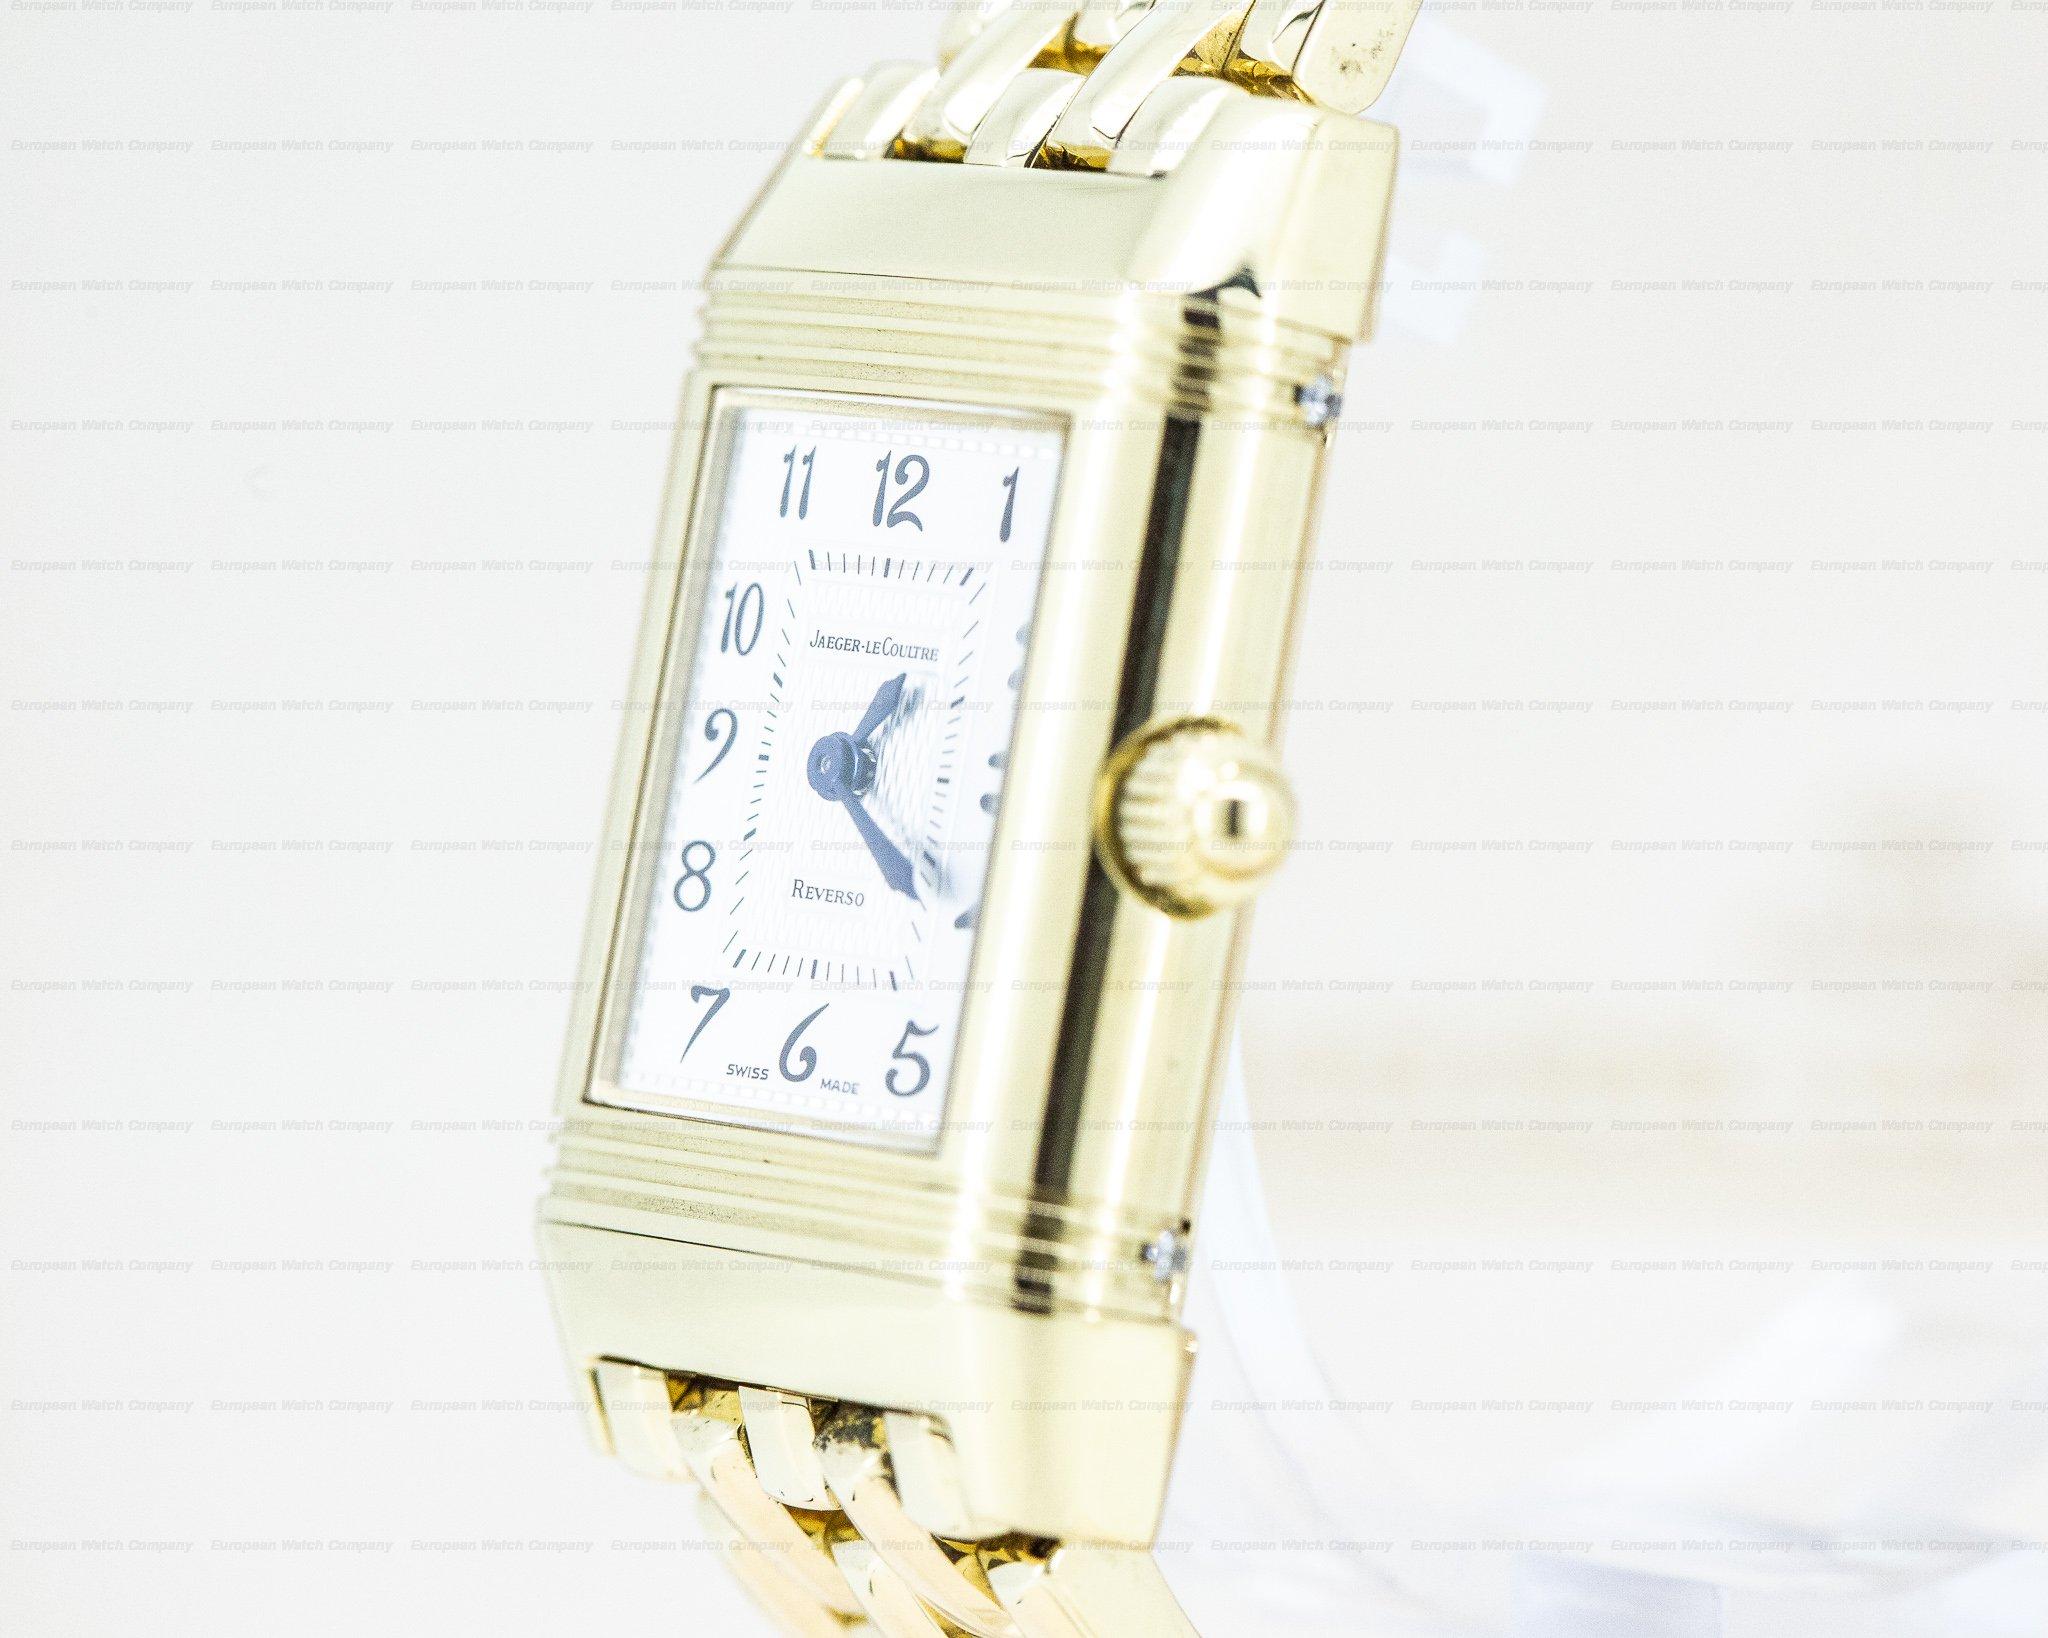 Jaeger LeCoultre Q2661110 Duetto Manual Wind 18K Yellow on bracelet / Diamond MOP